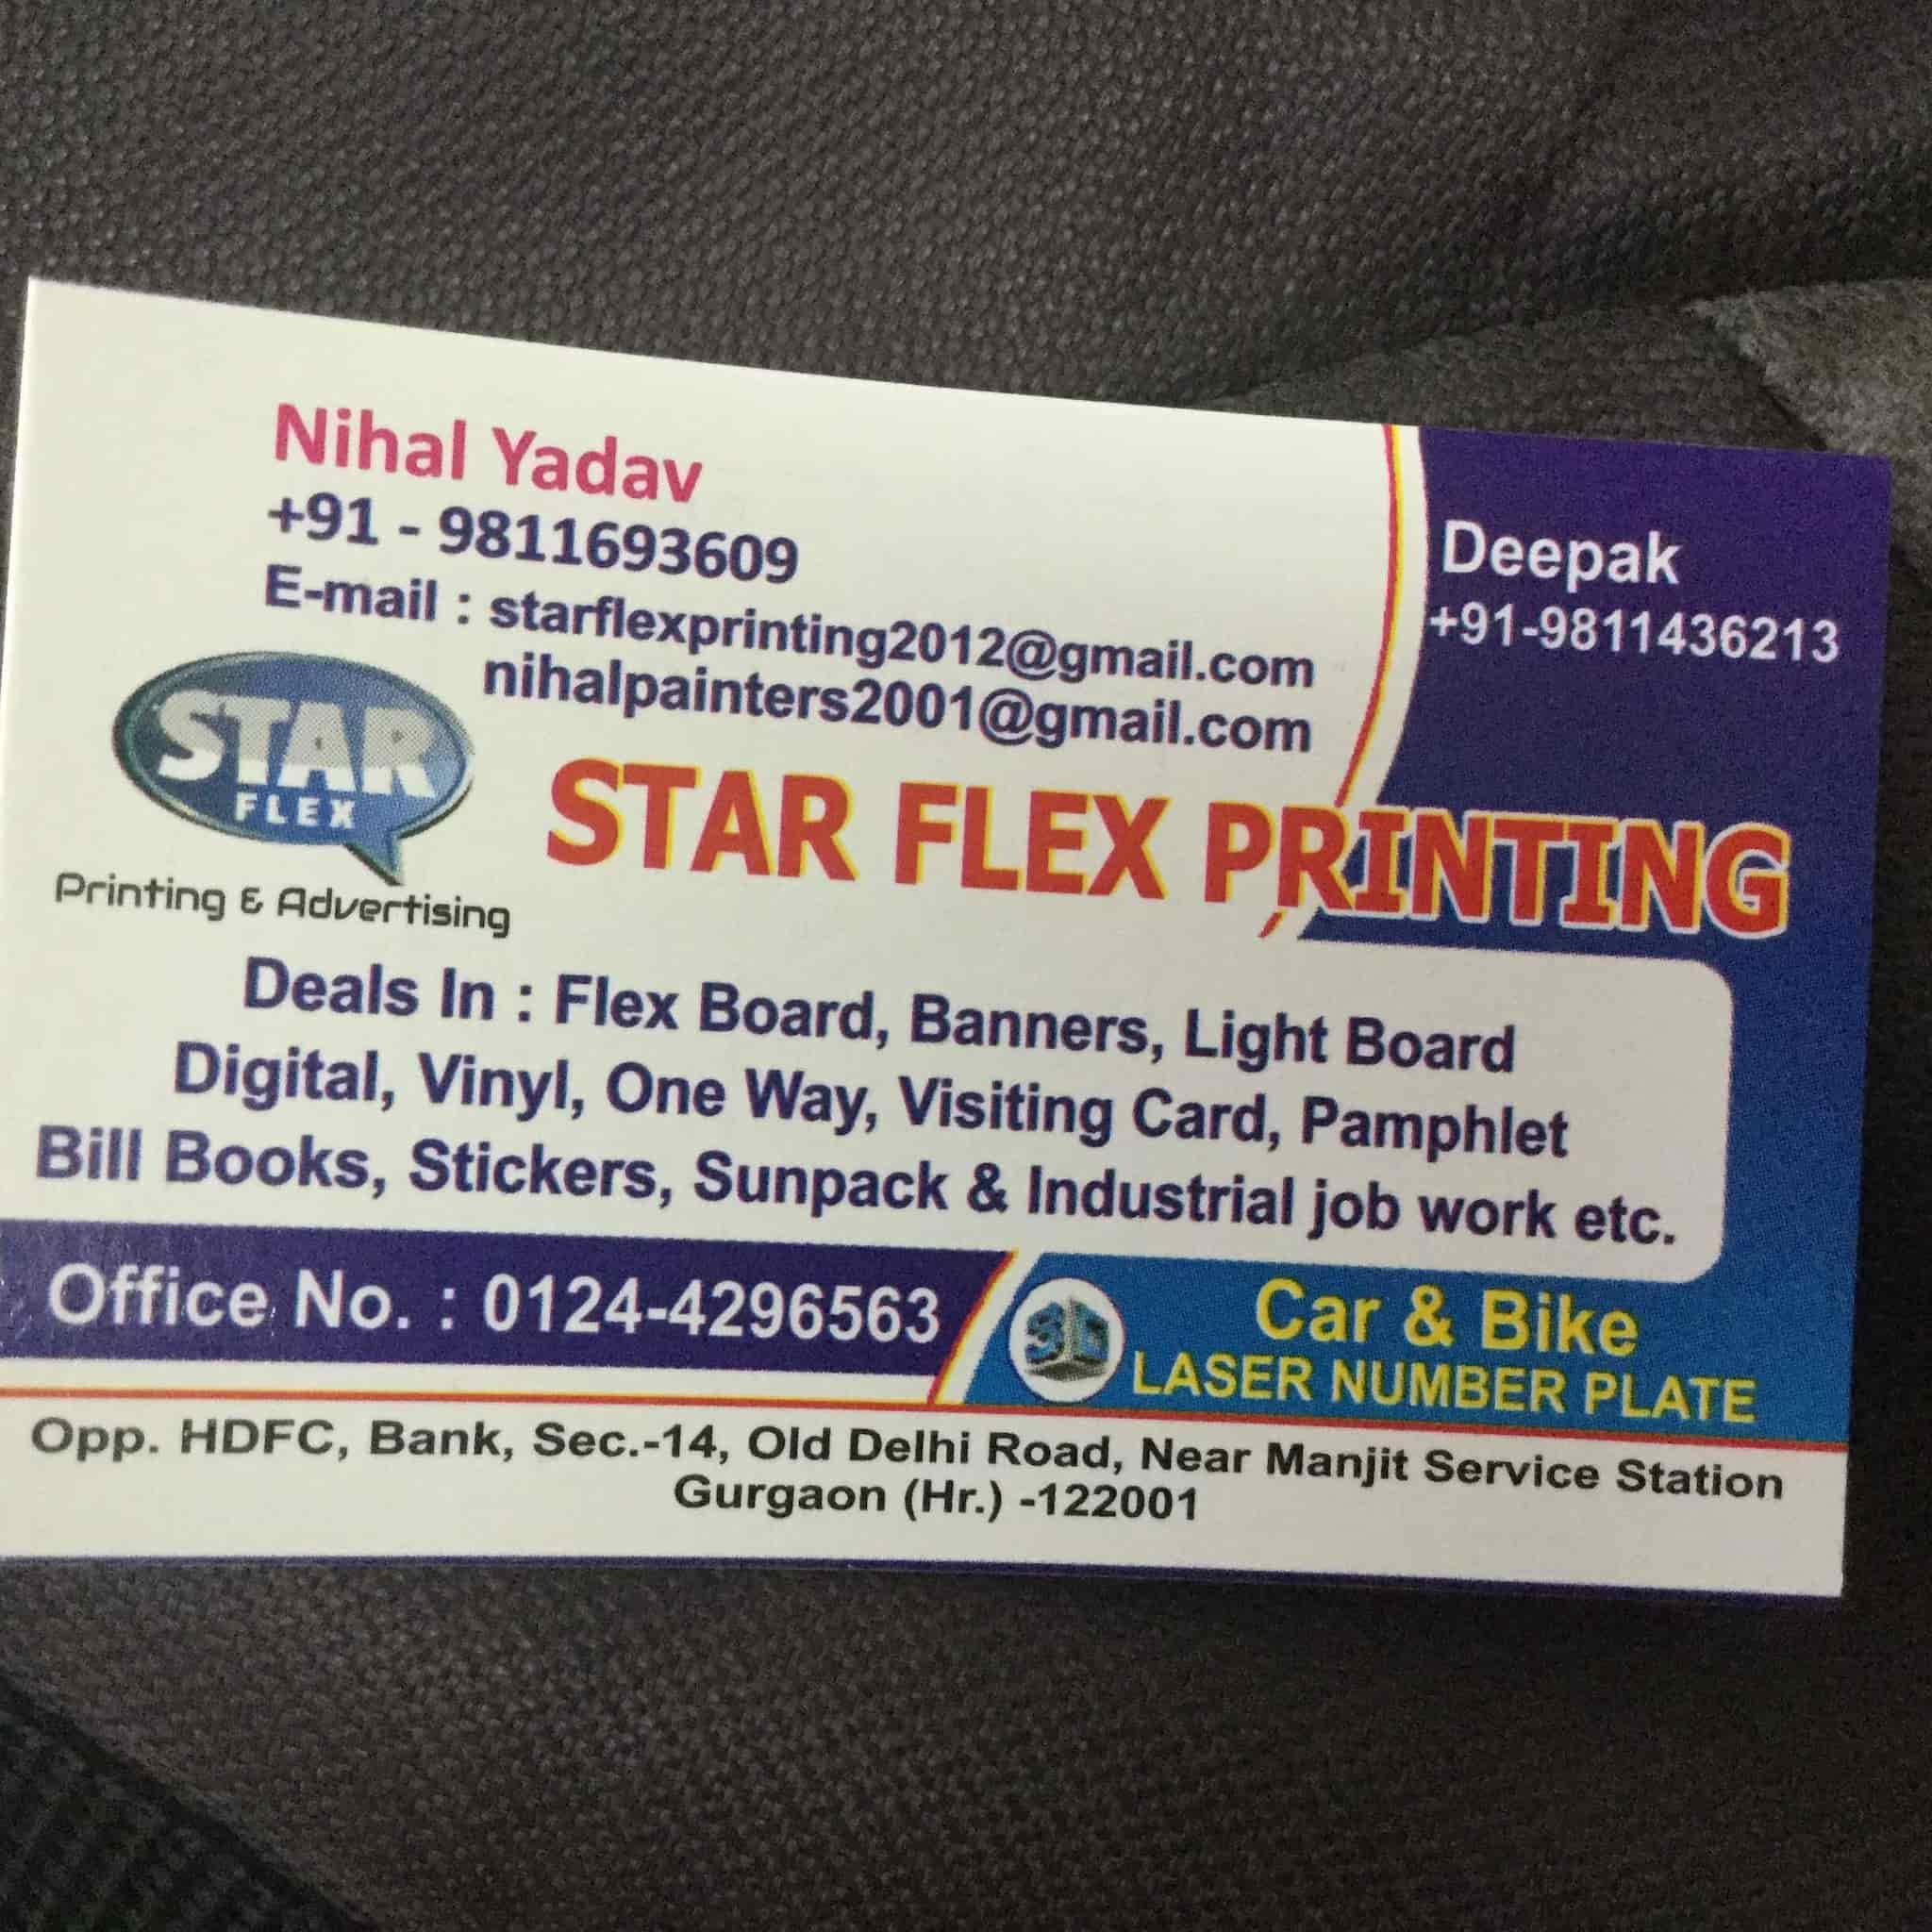 Star flex printing photos sector 14 gurgaon pictures images star flex printing photos sector 14 delhi printers for visiting card reheart Gallery